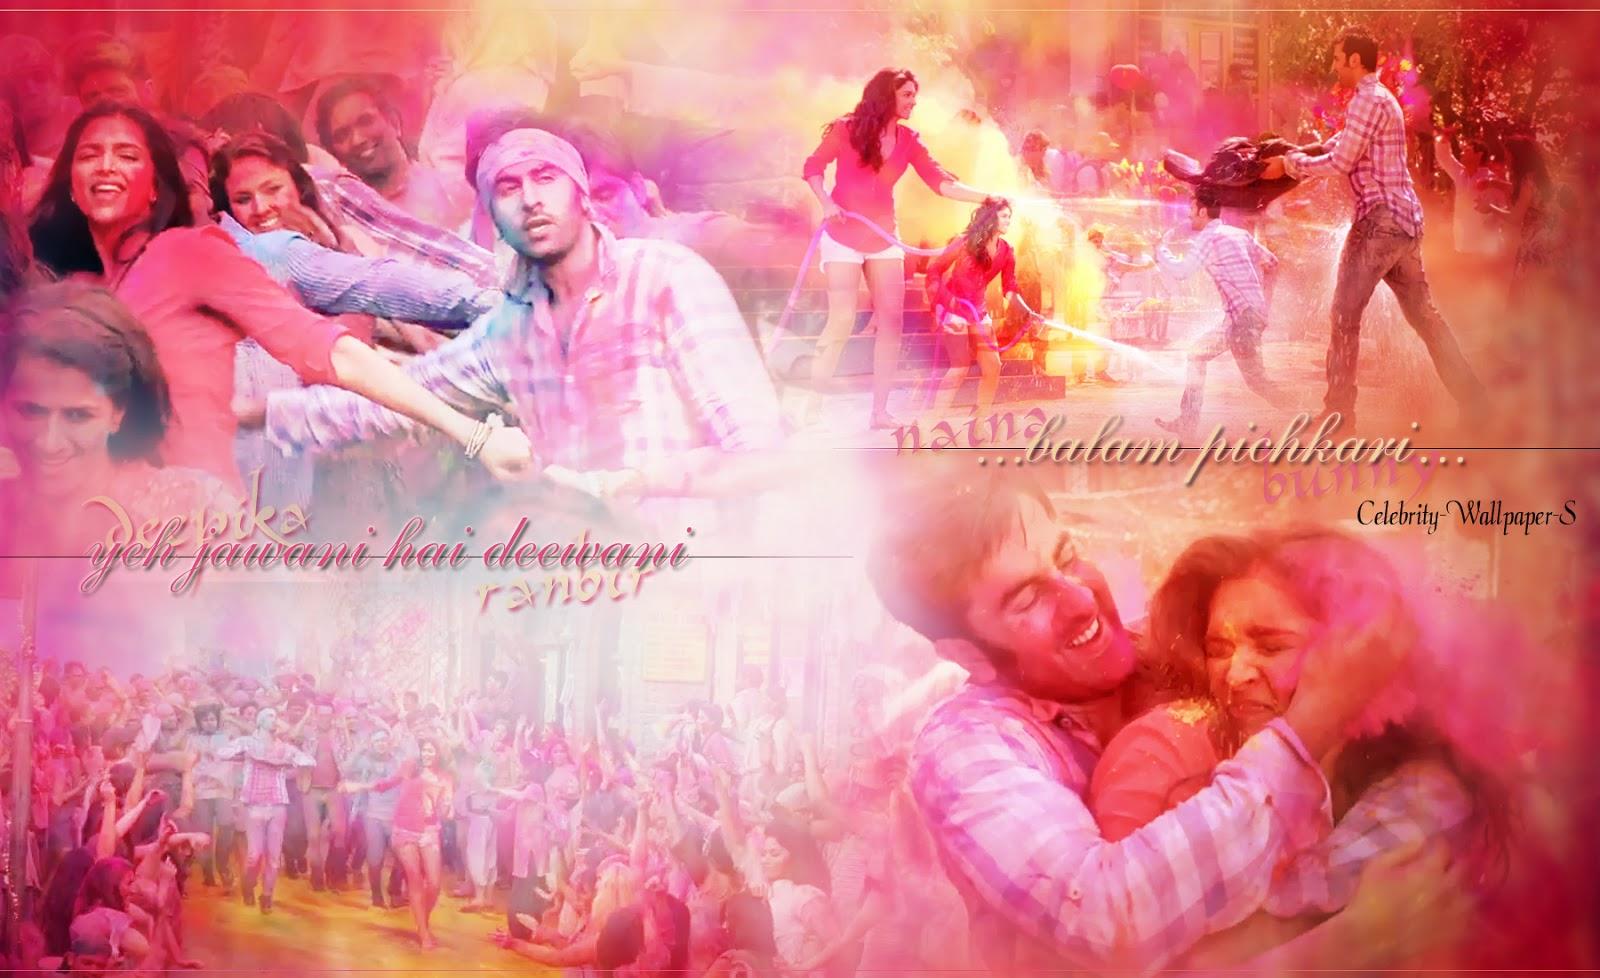 Ranbir Kapoor Deepika Padukone Wallpaper HQ YJHD Yeh ...